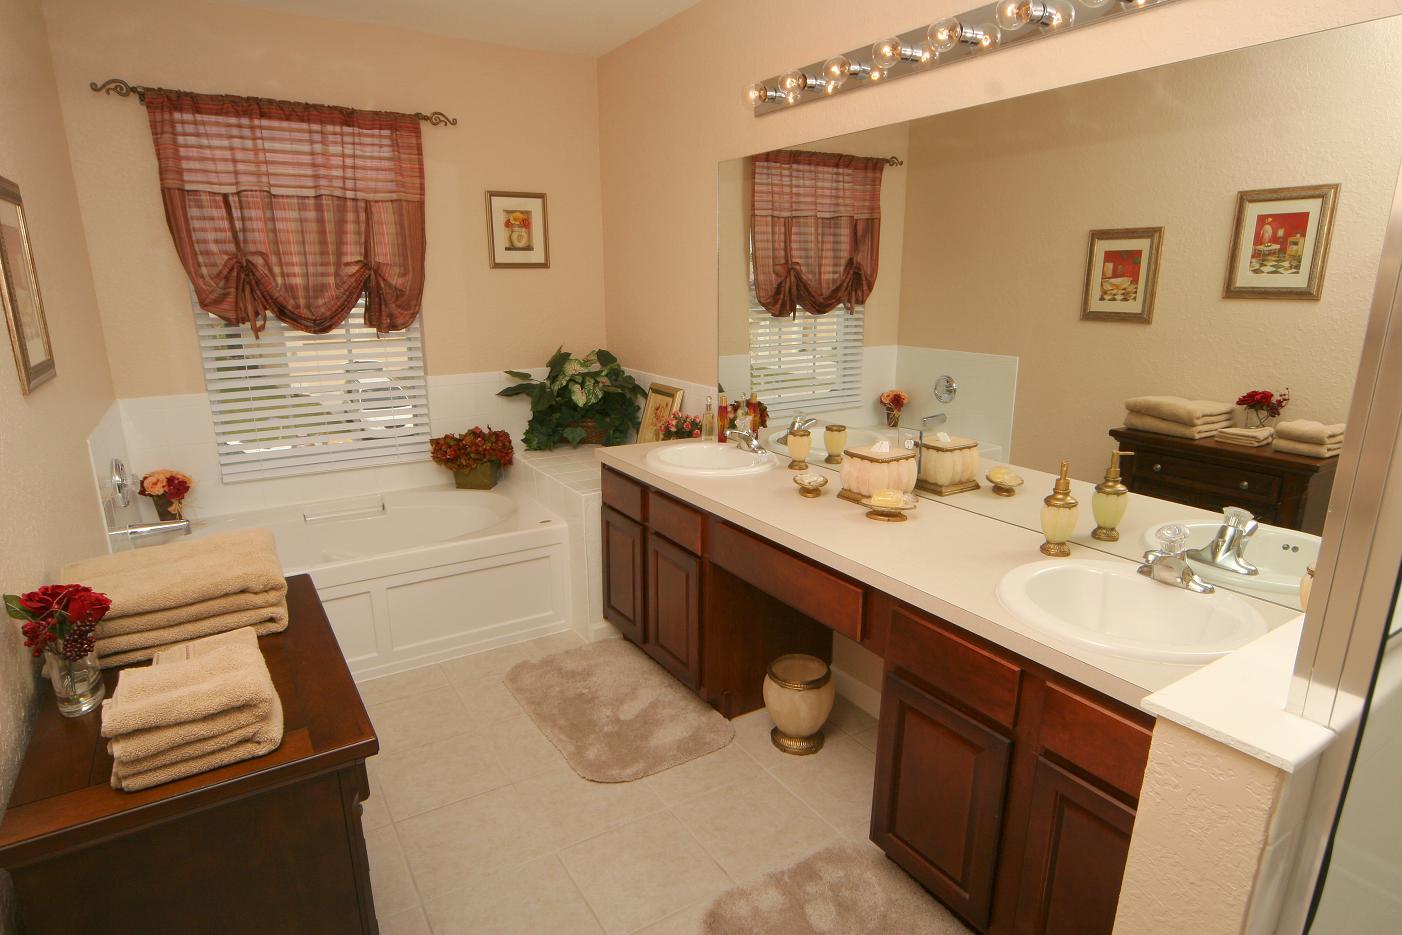 Master Bathroom Master Bathroom Large And Beautiful Photos Photo To Select